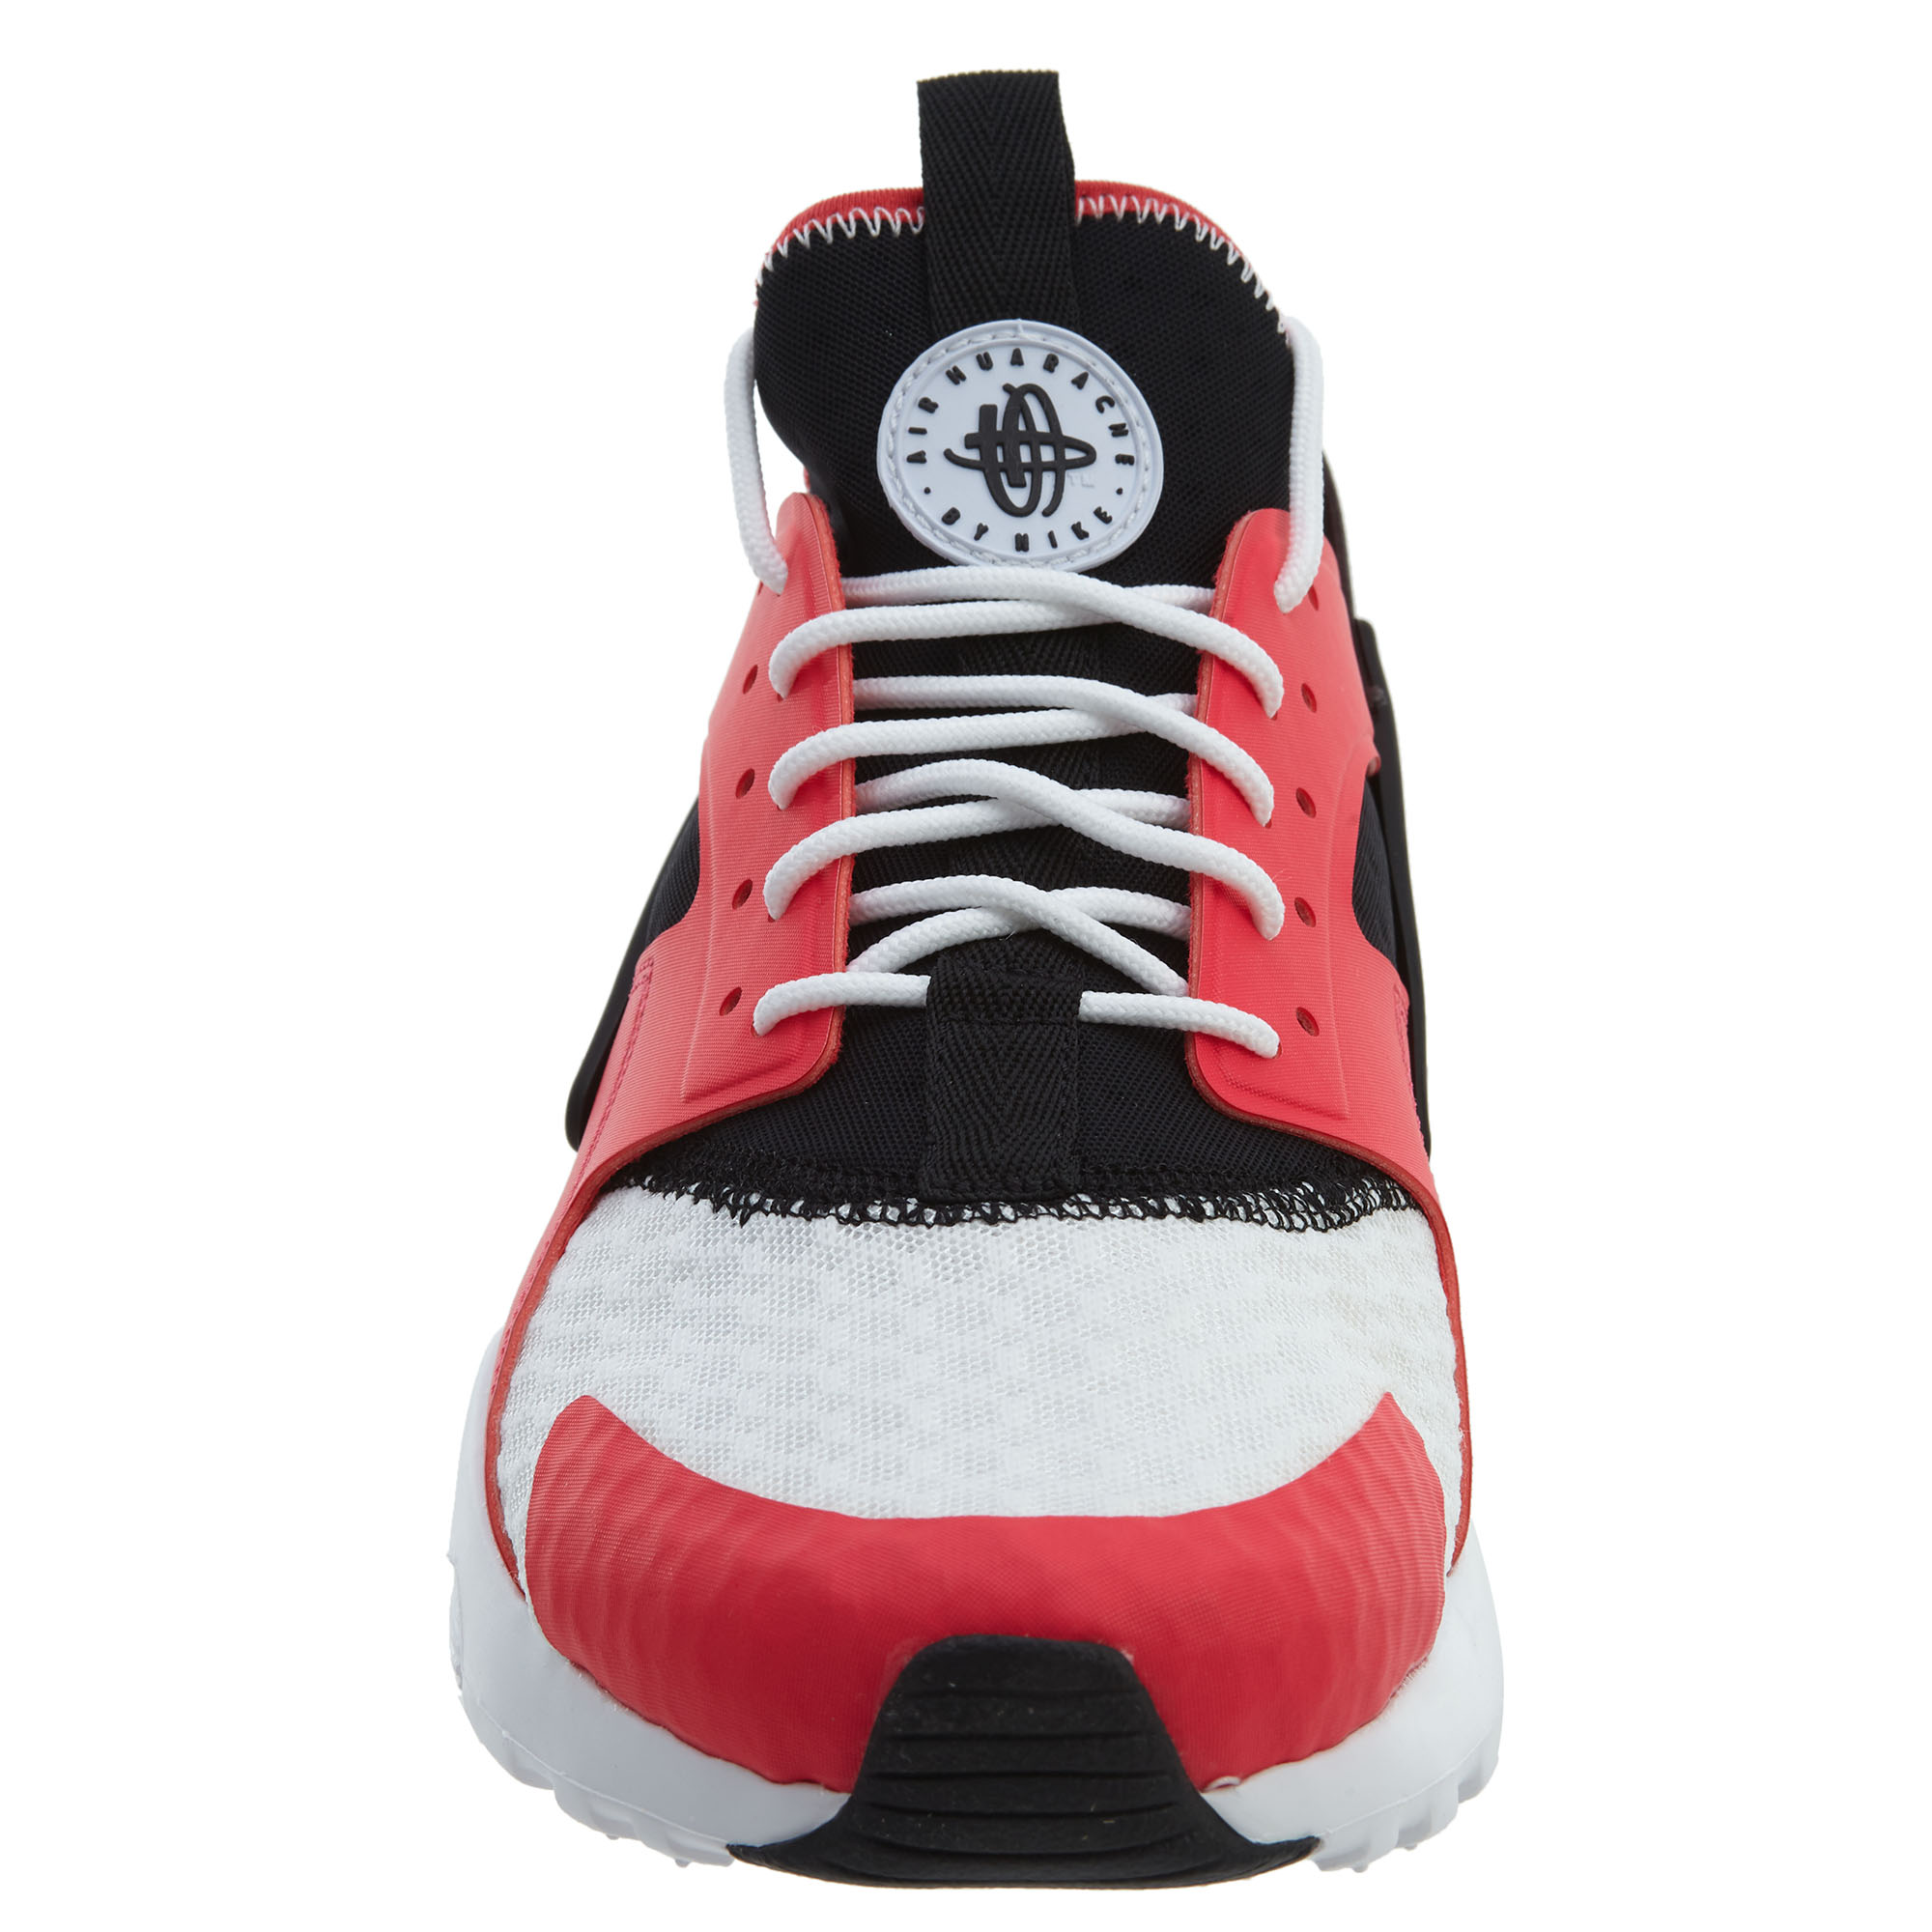 Nike Men's Air Huarache Run Ultra Shoes (Red/Black, 8.0)